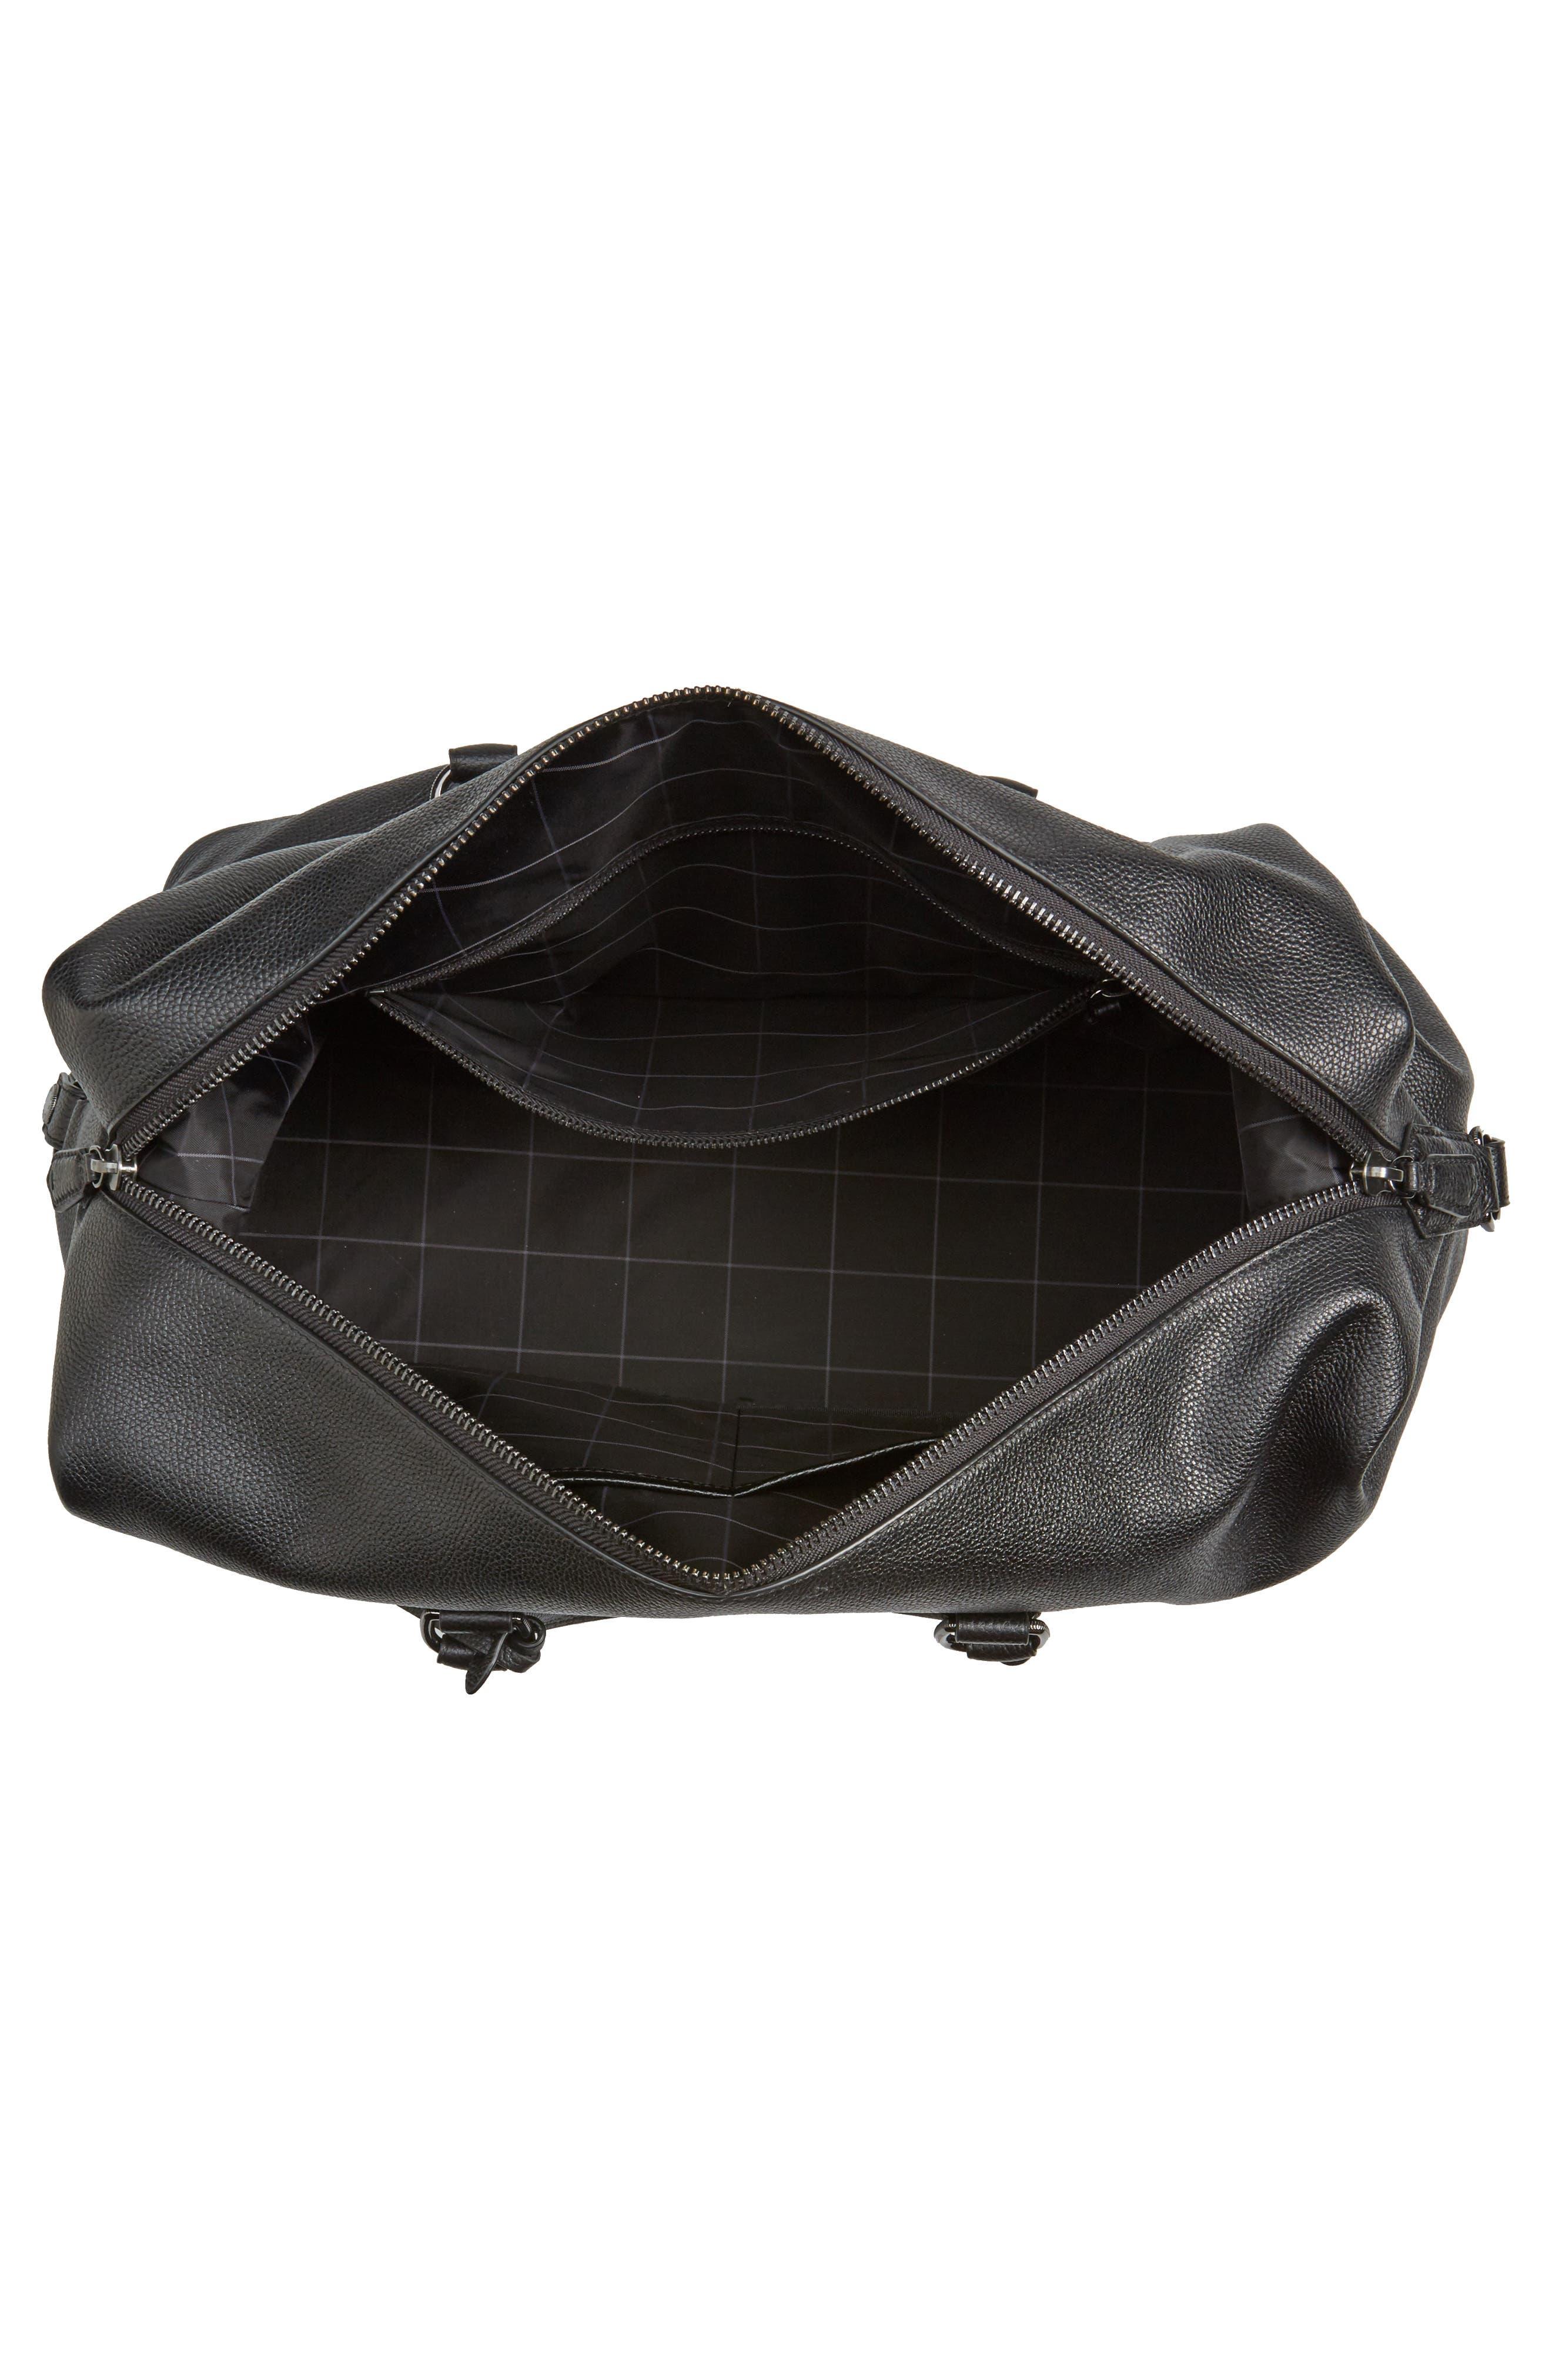 Alternate Image 3  - Polo Ralph Lauren Pebbled Leather Duffel Bag